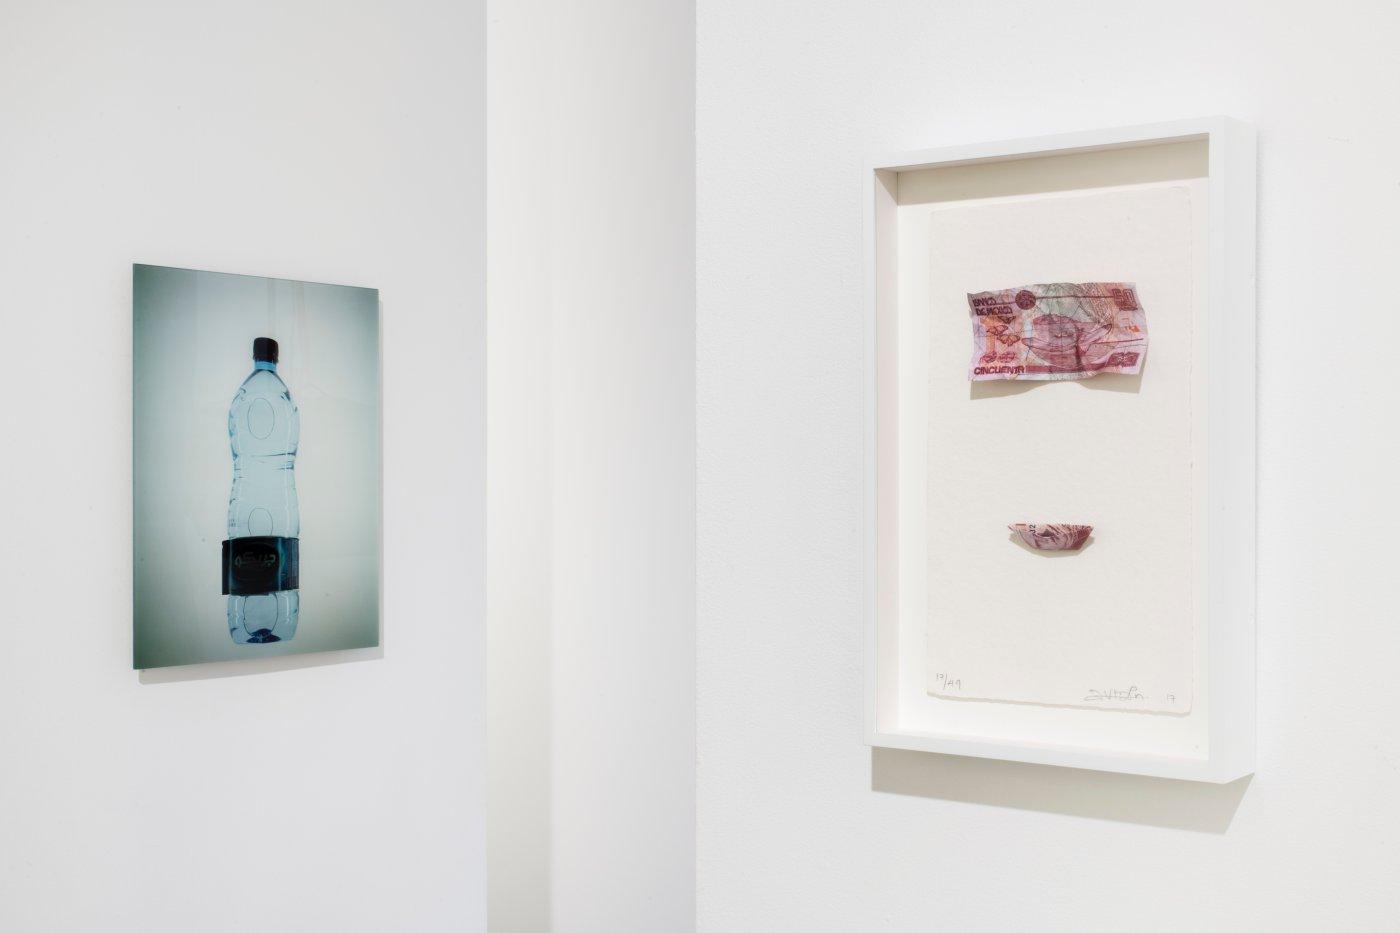 Galerie Chantal Crousel Rhe 4